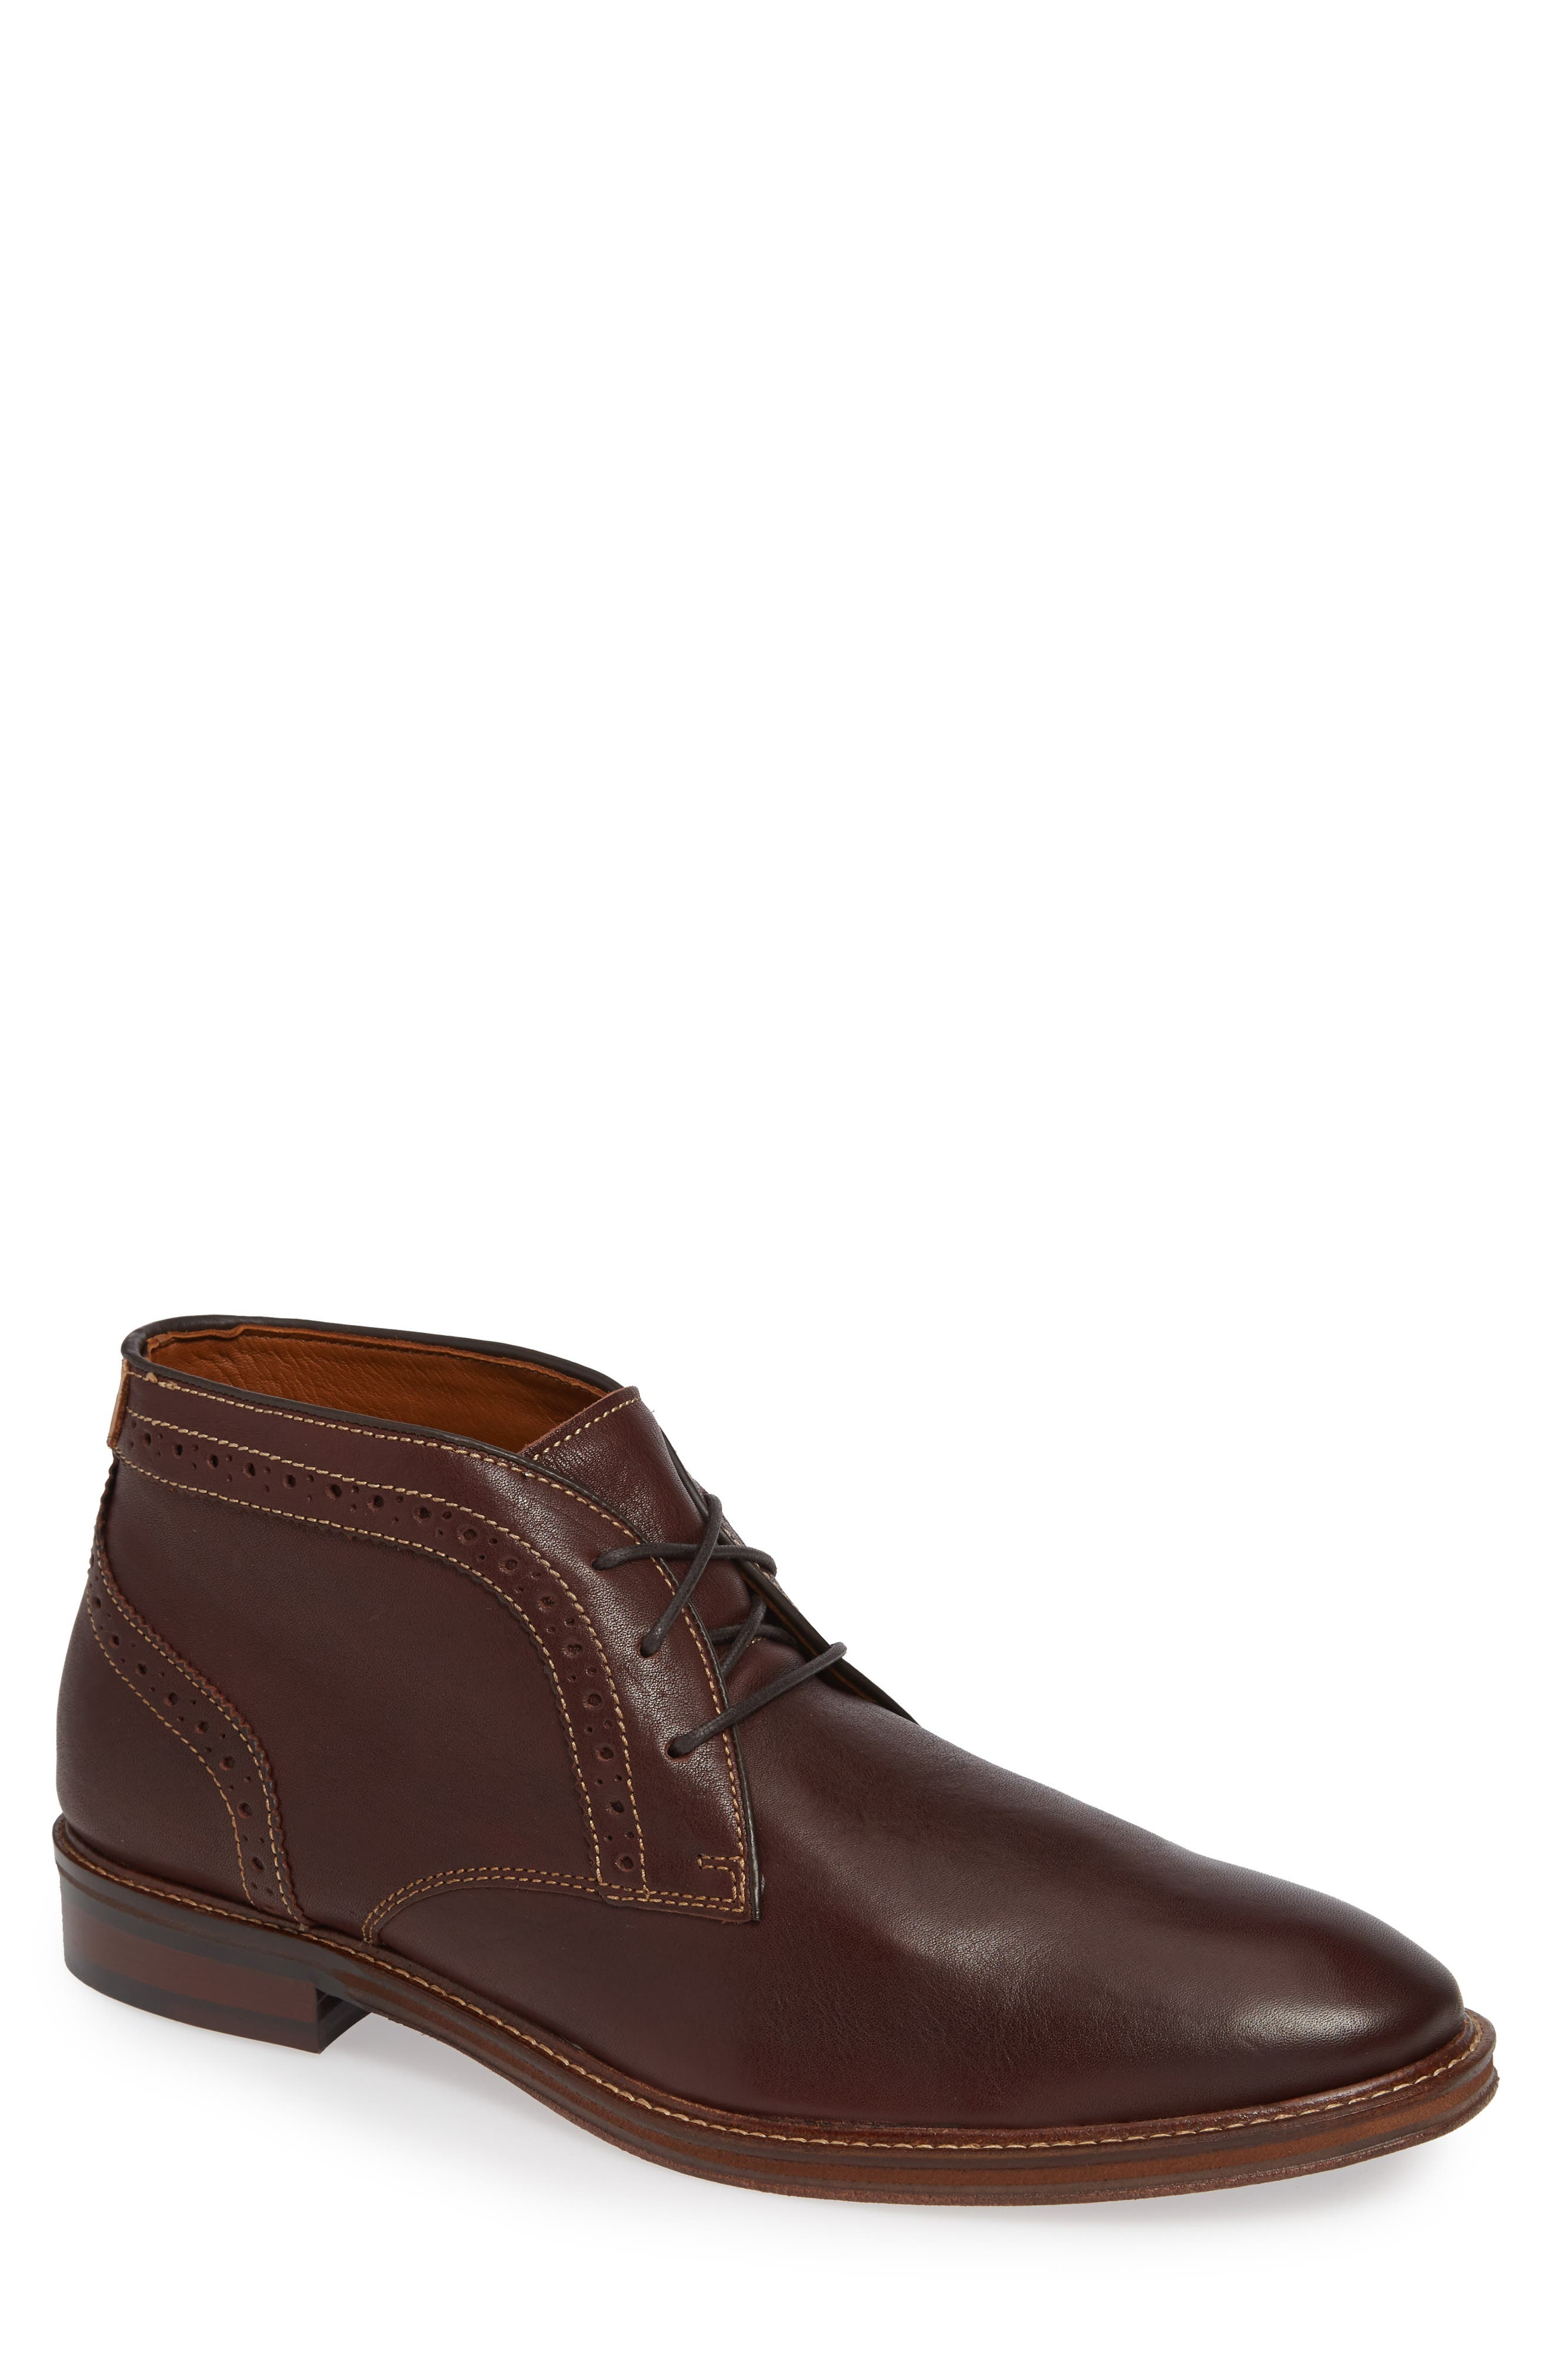 Johnston & Murphy Warner Chukka Boot- Brown